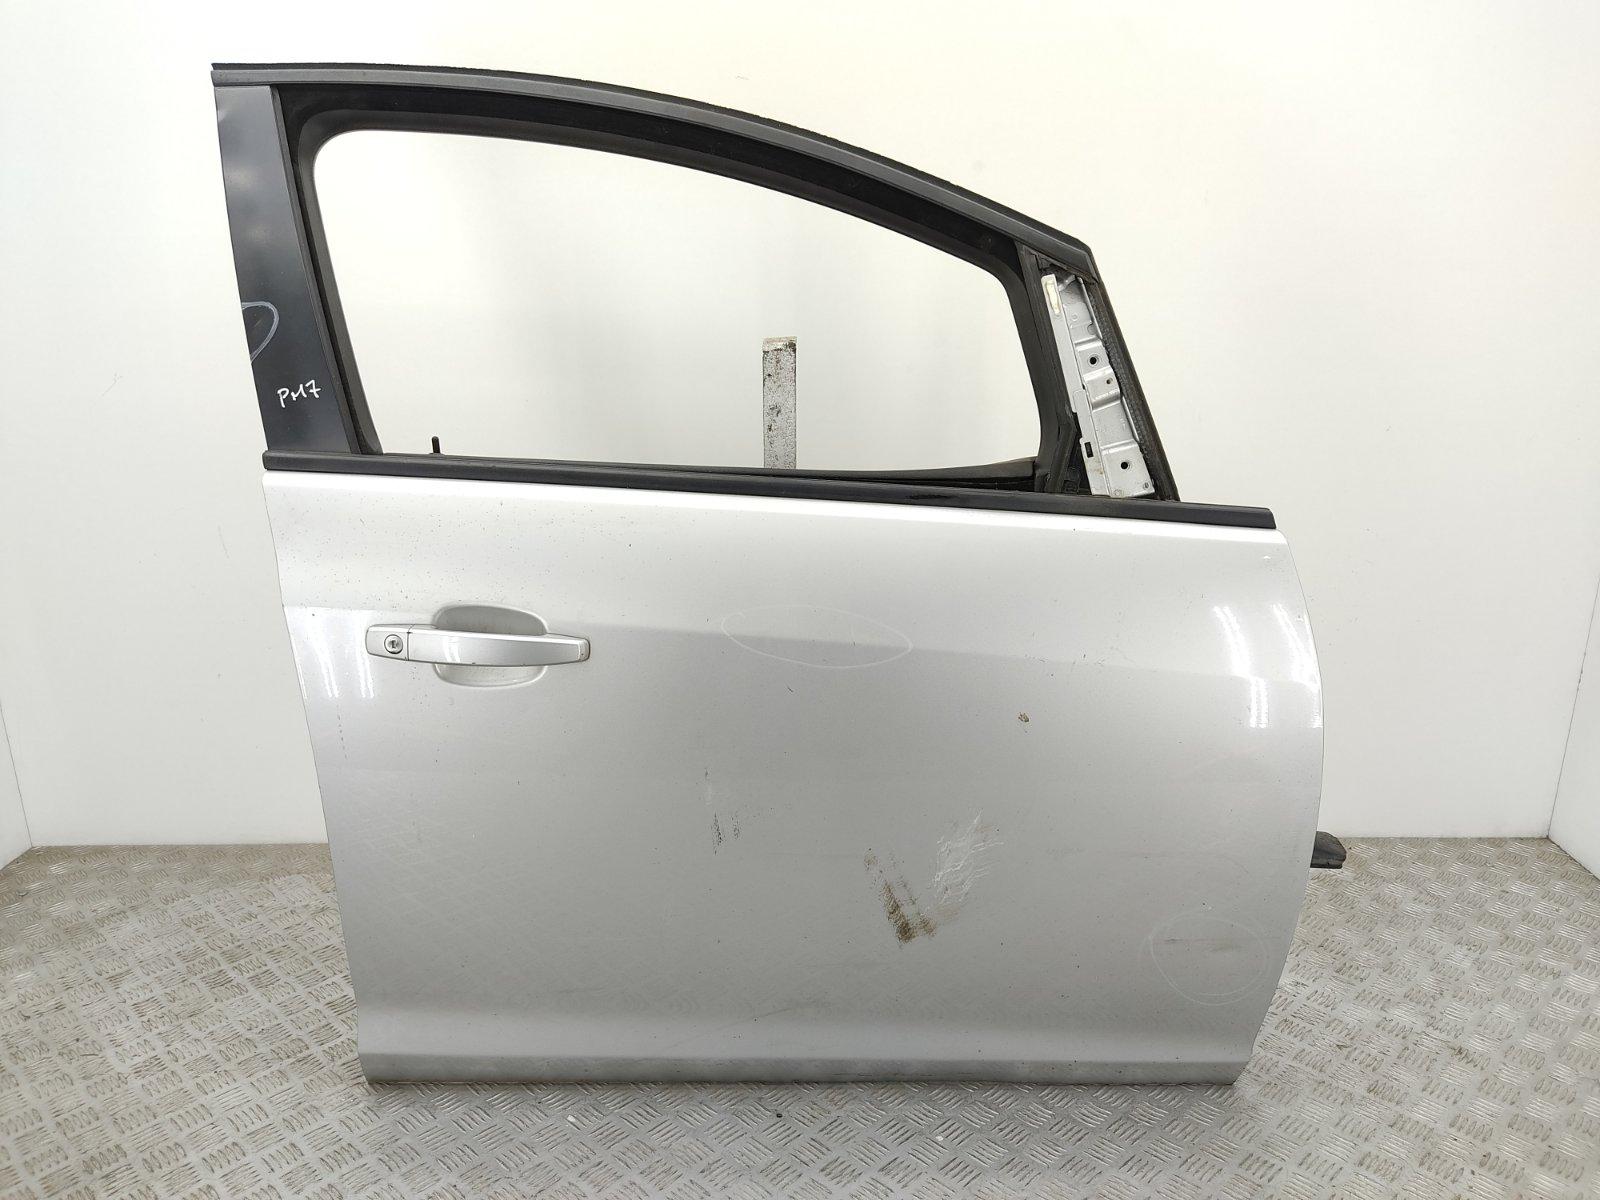 Дверь передняя правая Opel Astra J 1.7 CDTI 2010 (б/у)